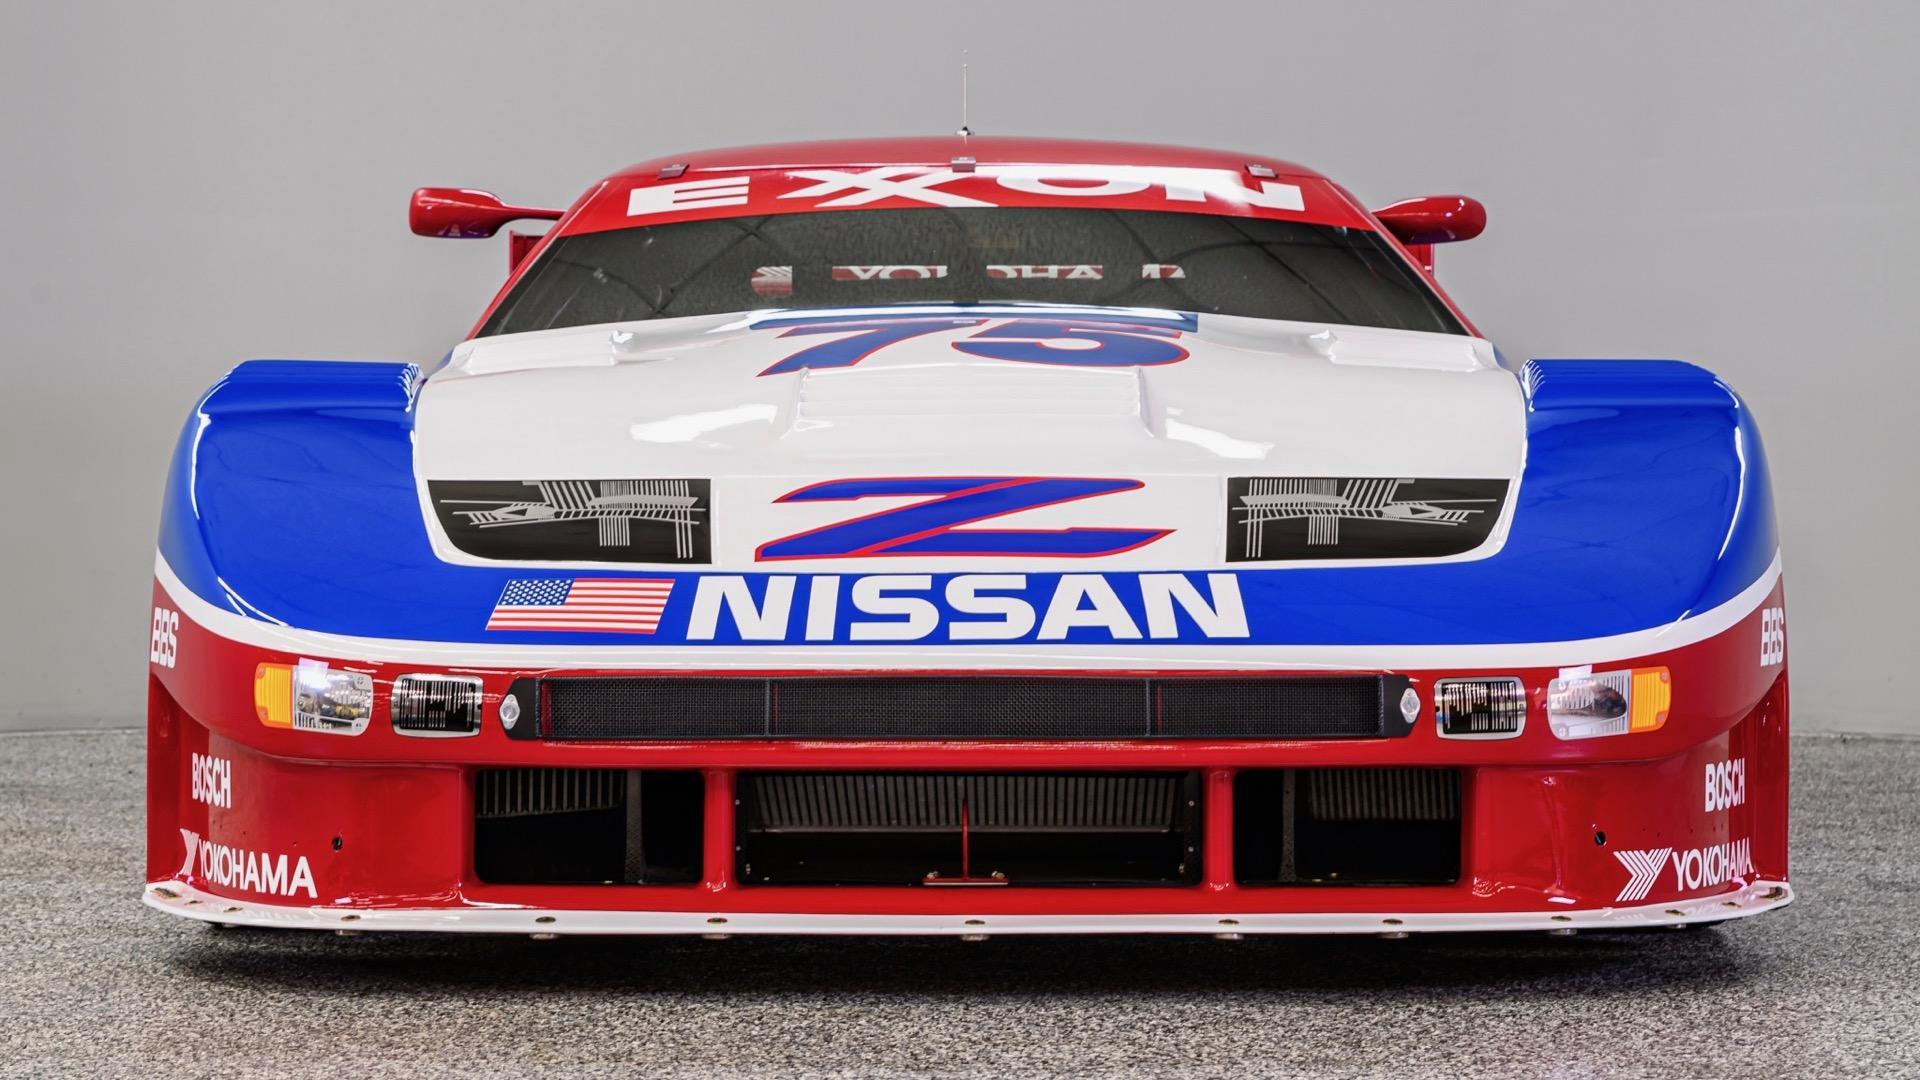 1990 nissan 300zx twin turbo imsa gto race car photo by bring a trailer 100791728 h